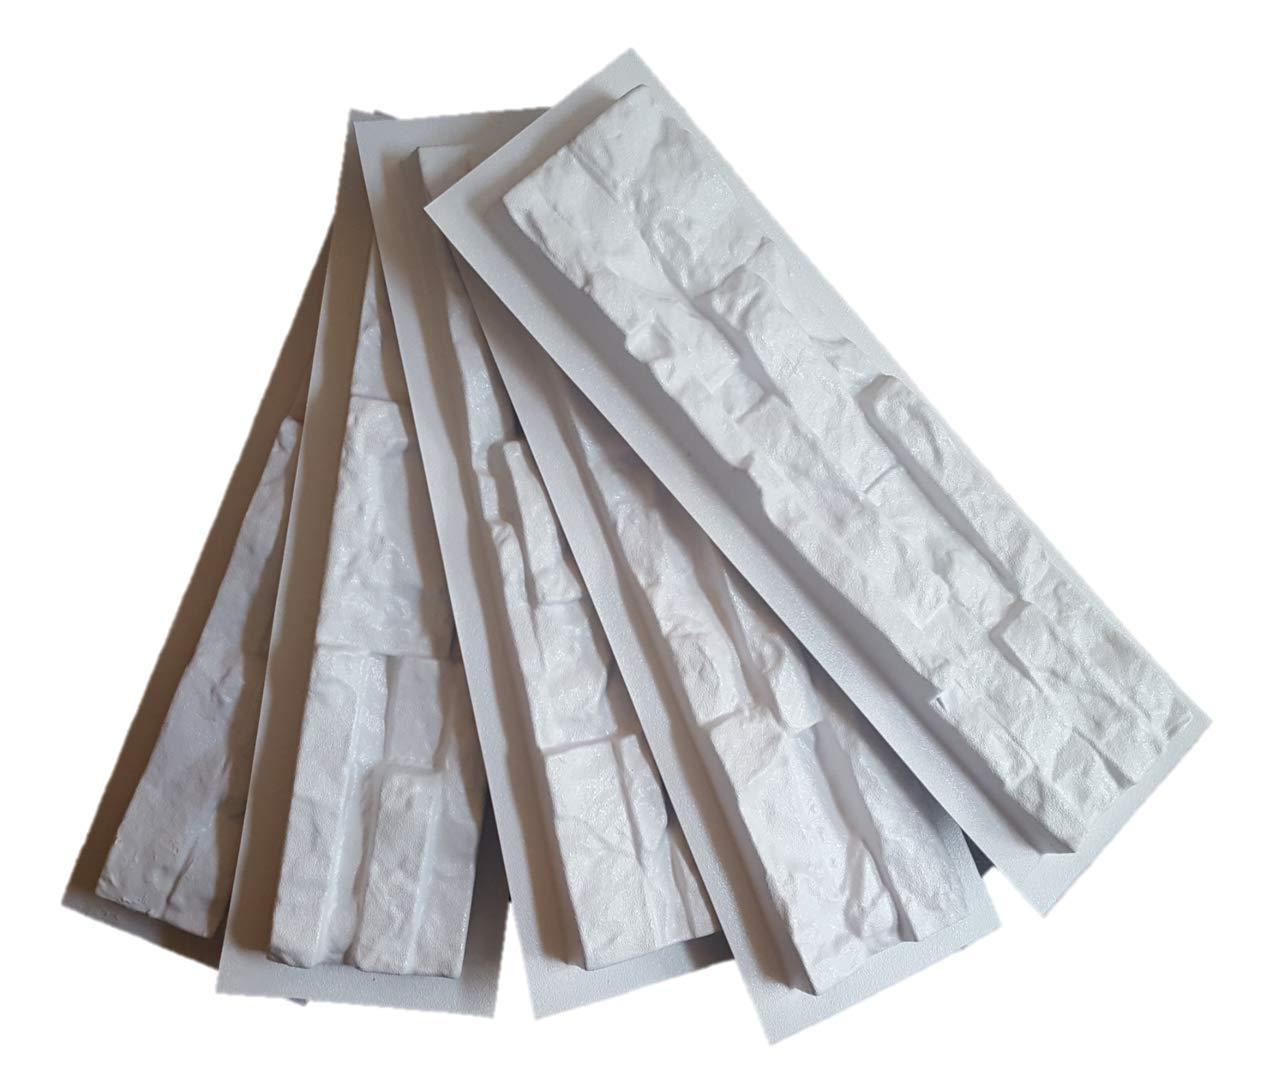 3 moldes para fachada de concreto. Imitación de muro de piedra